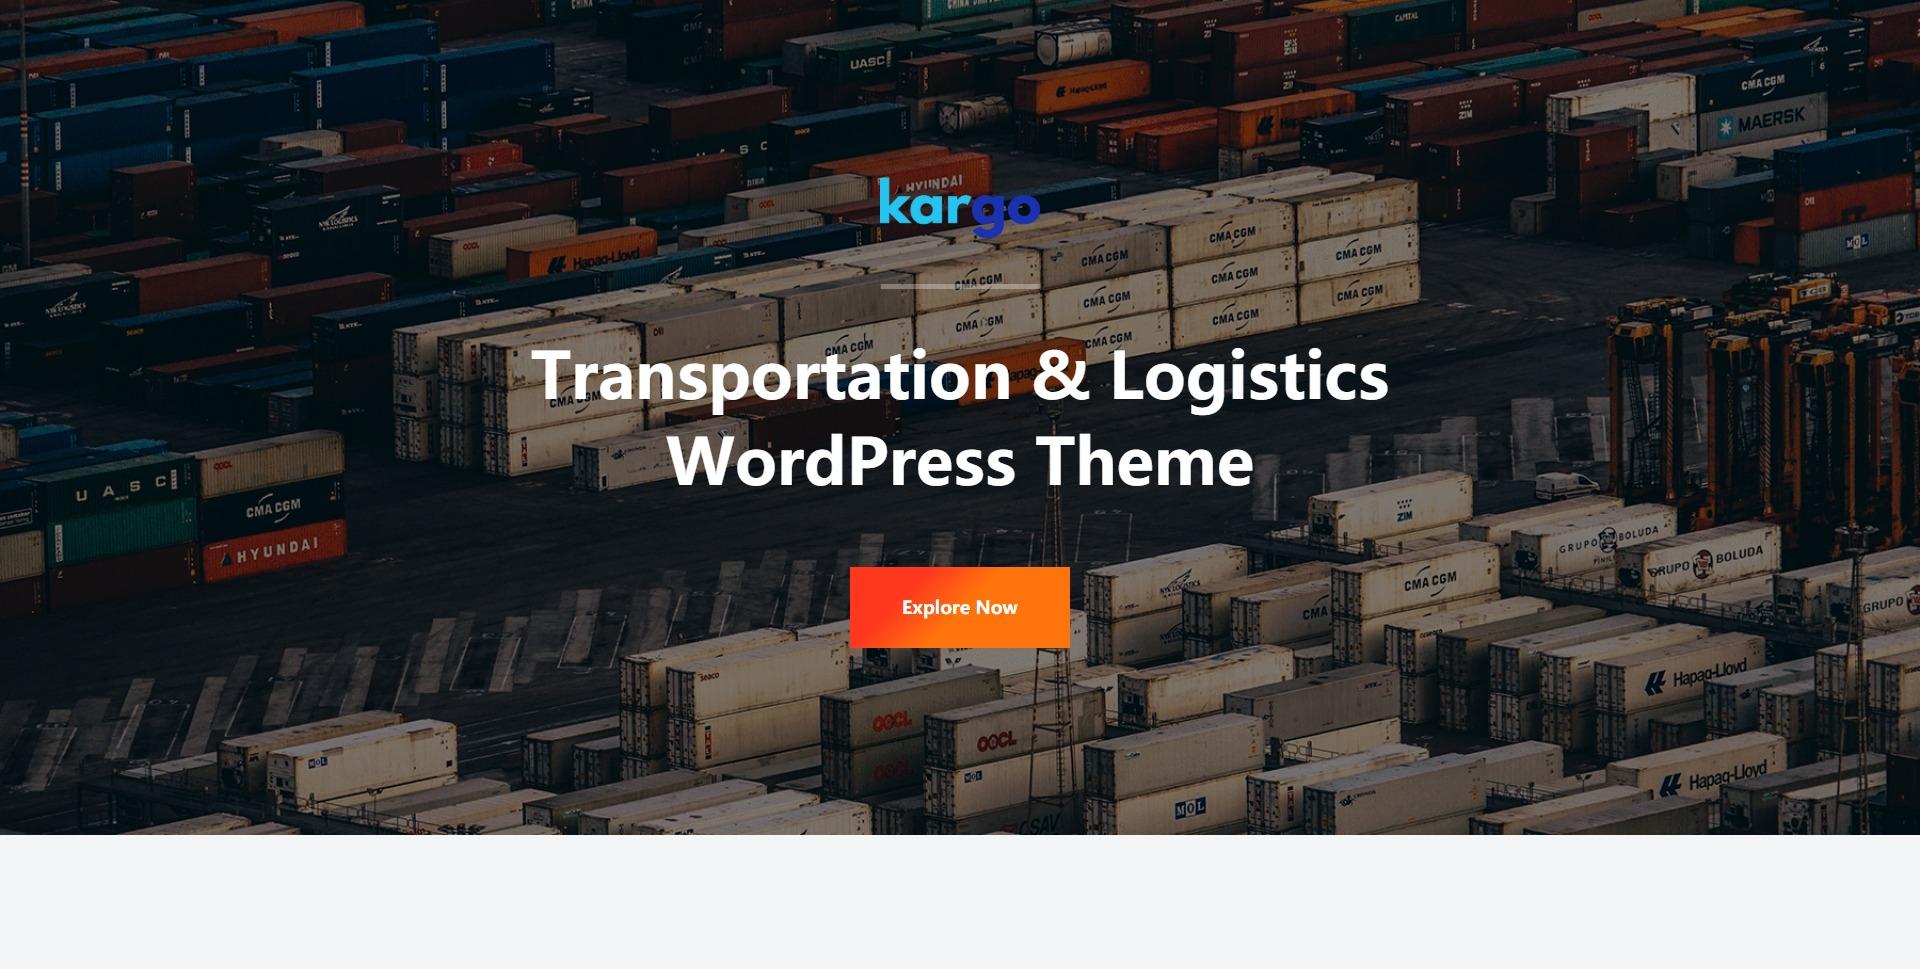 Kargo-物流运输仓储在线查寄快递WordPress主题